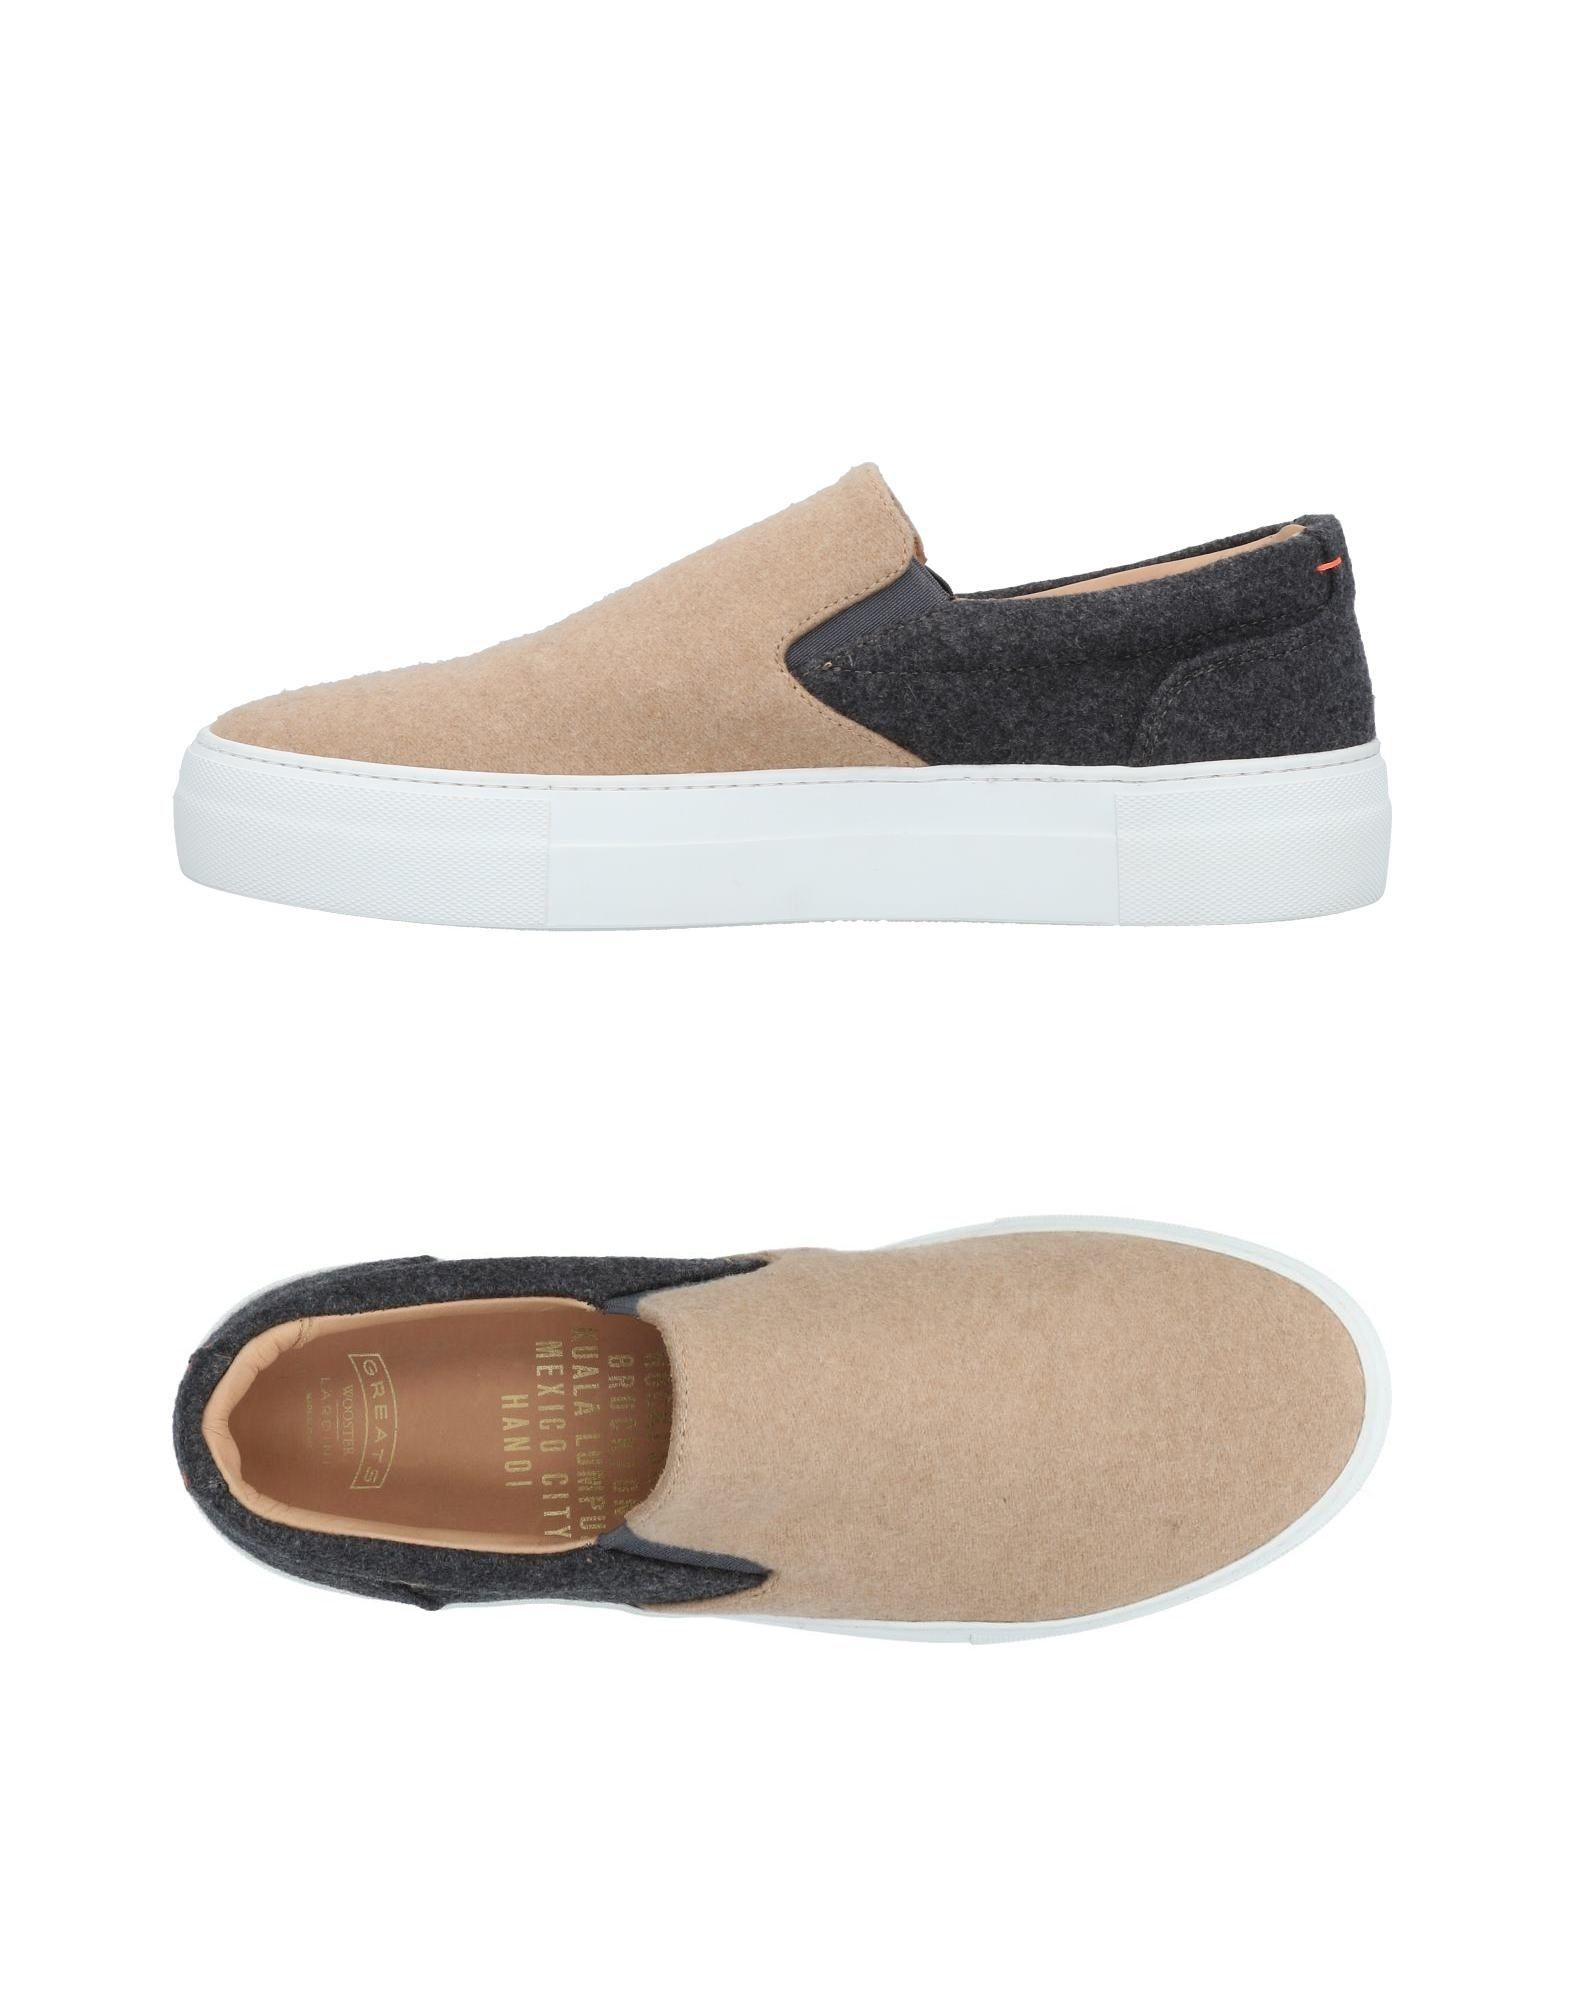 GREATS Sneakers in Grey